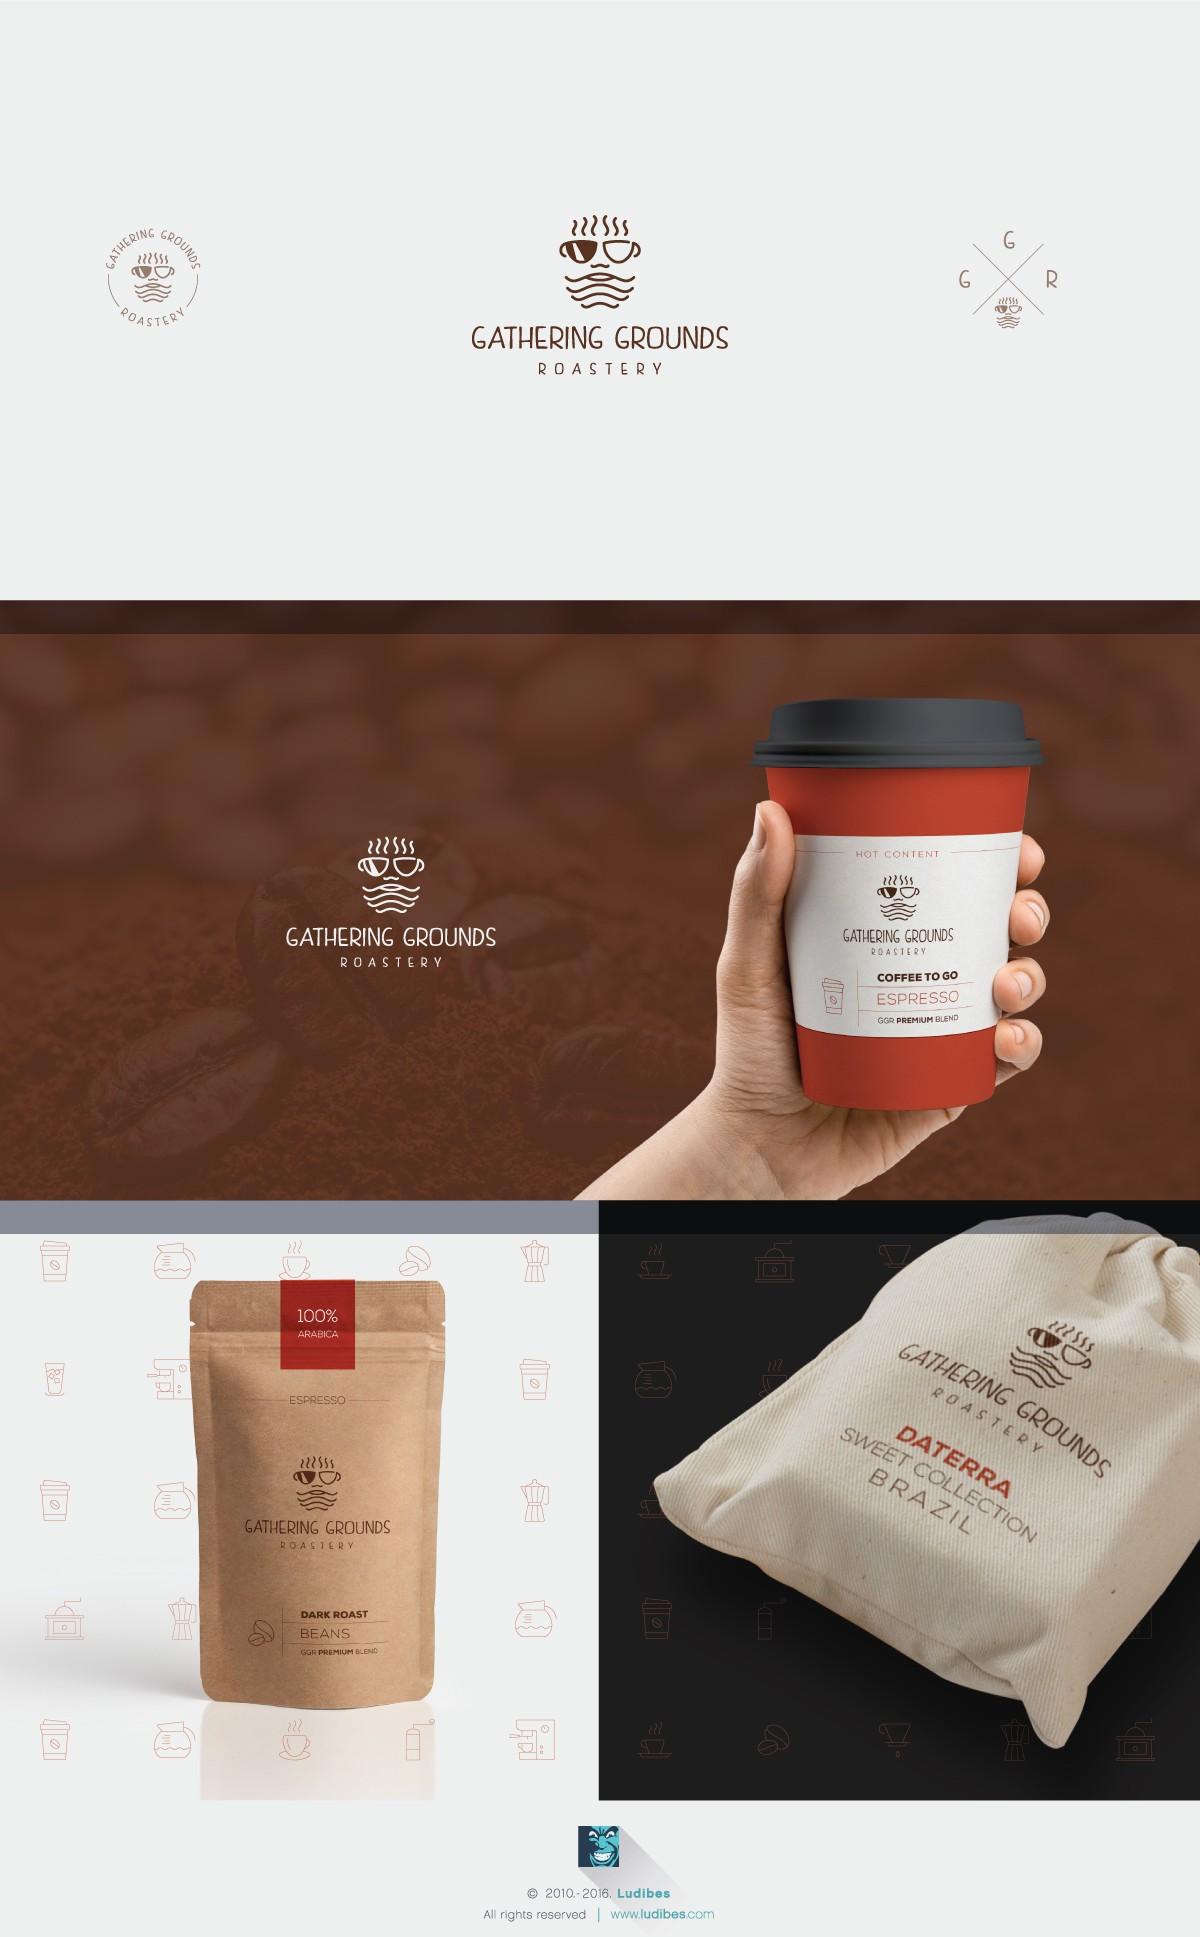 Stunning Yet Professional Brand Identity Design